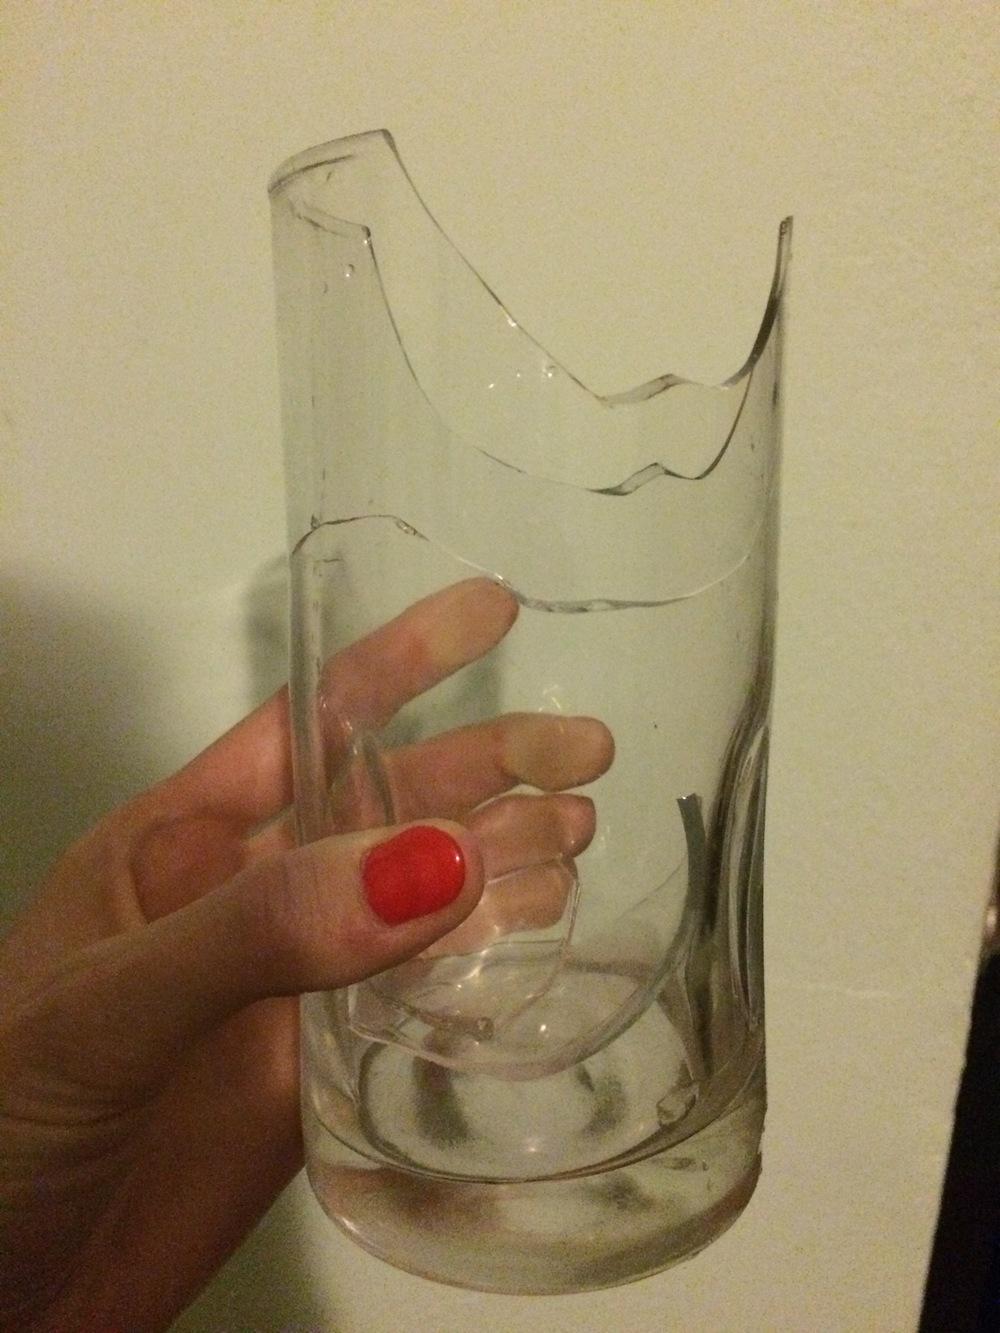 rip glass!